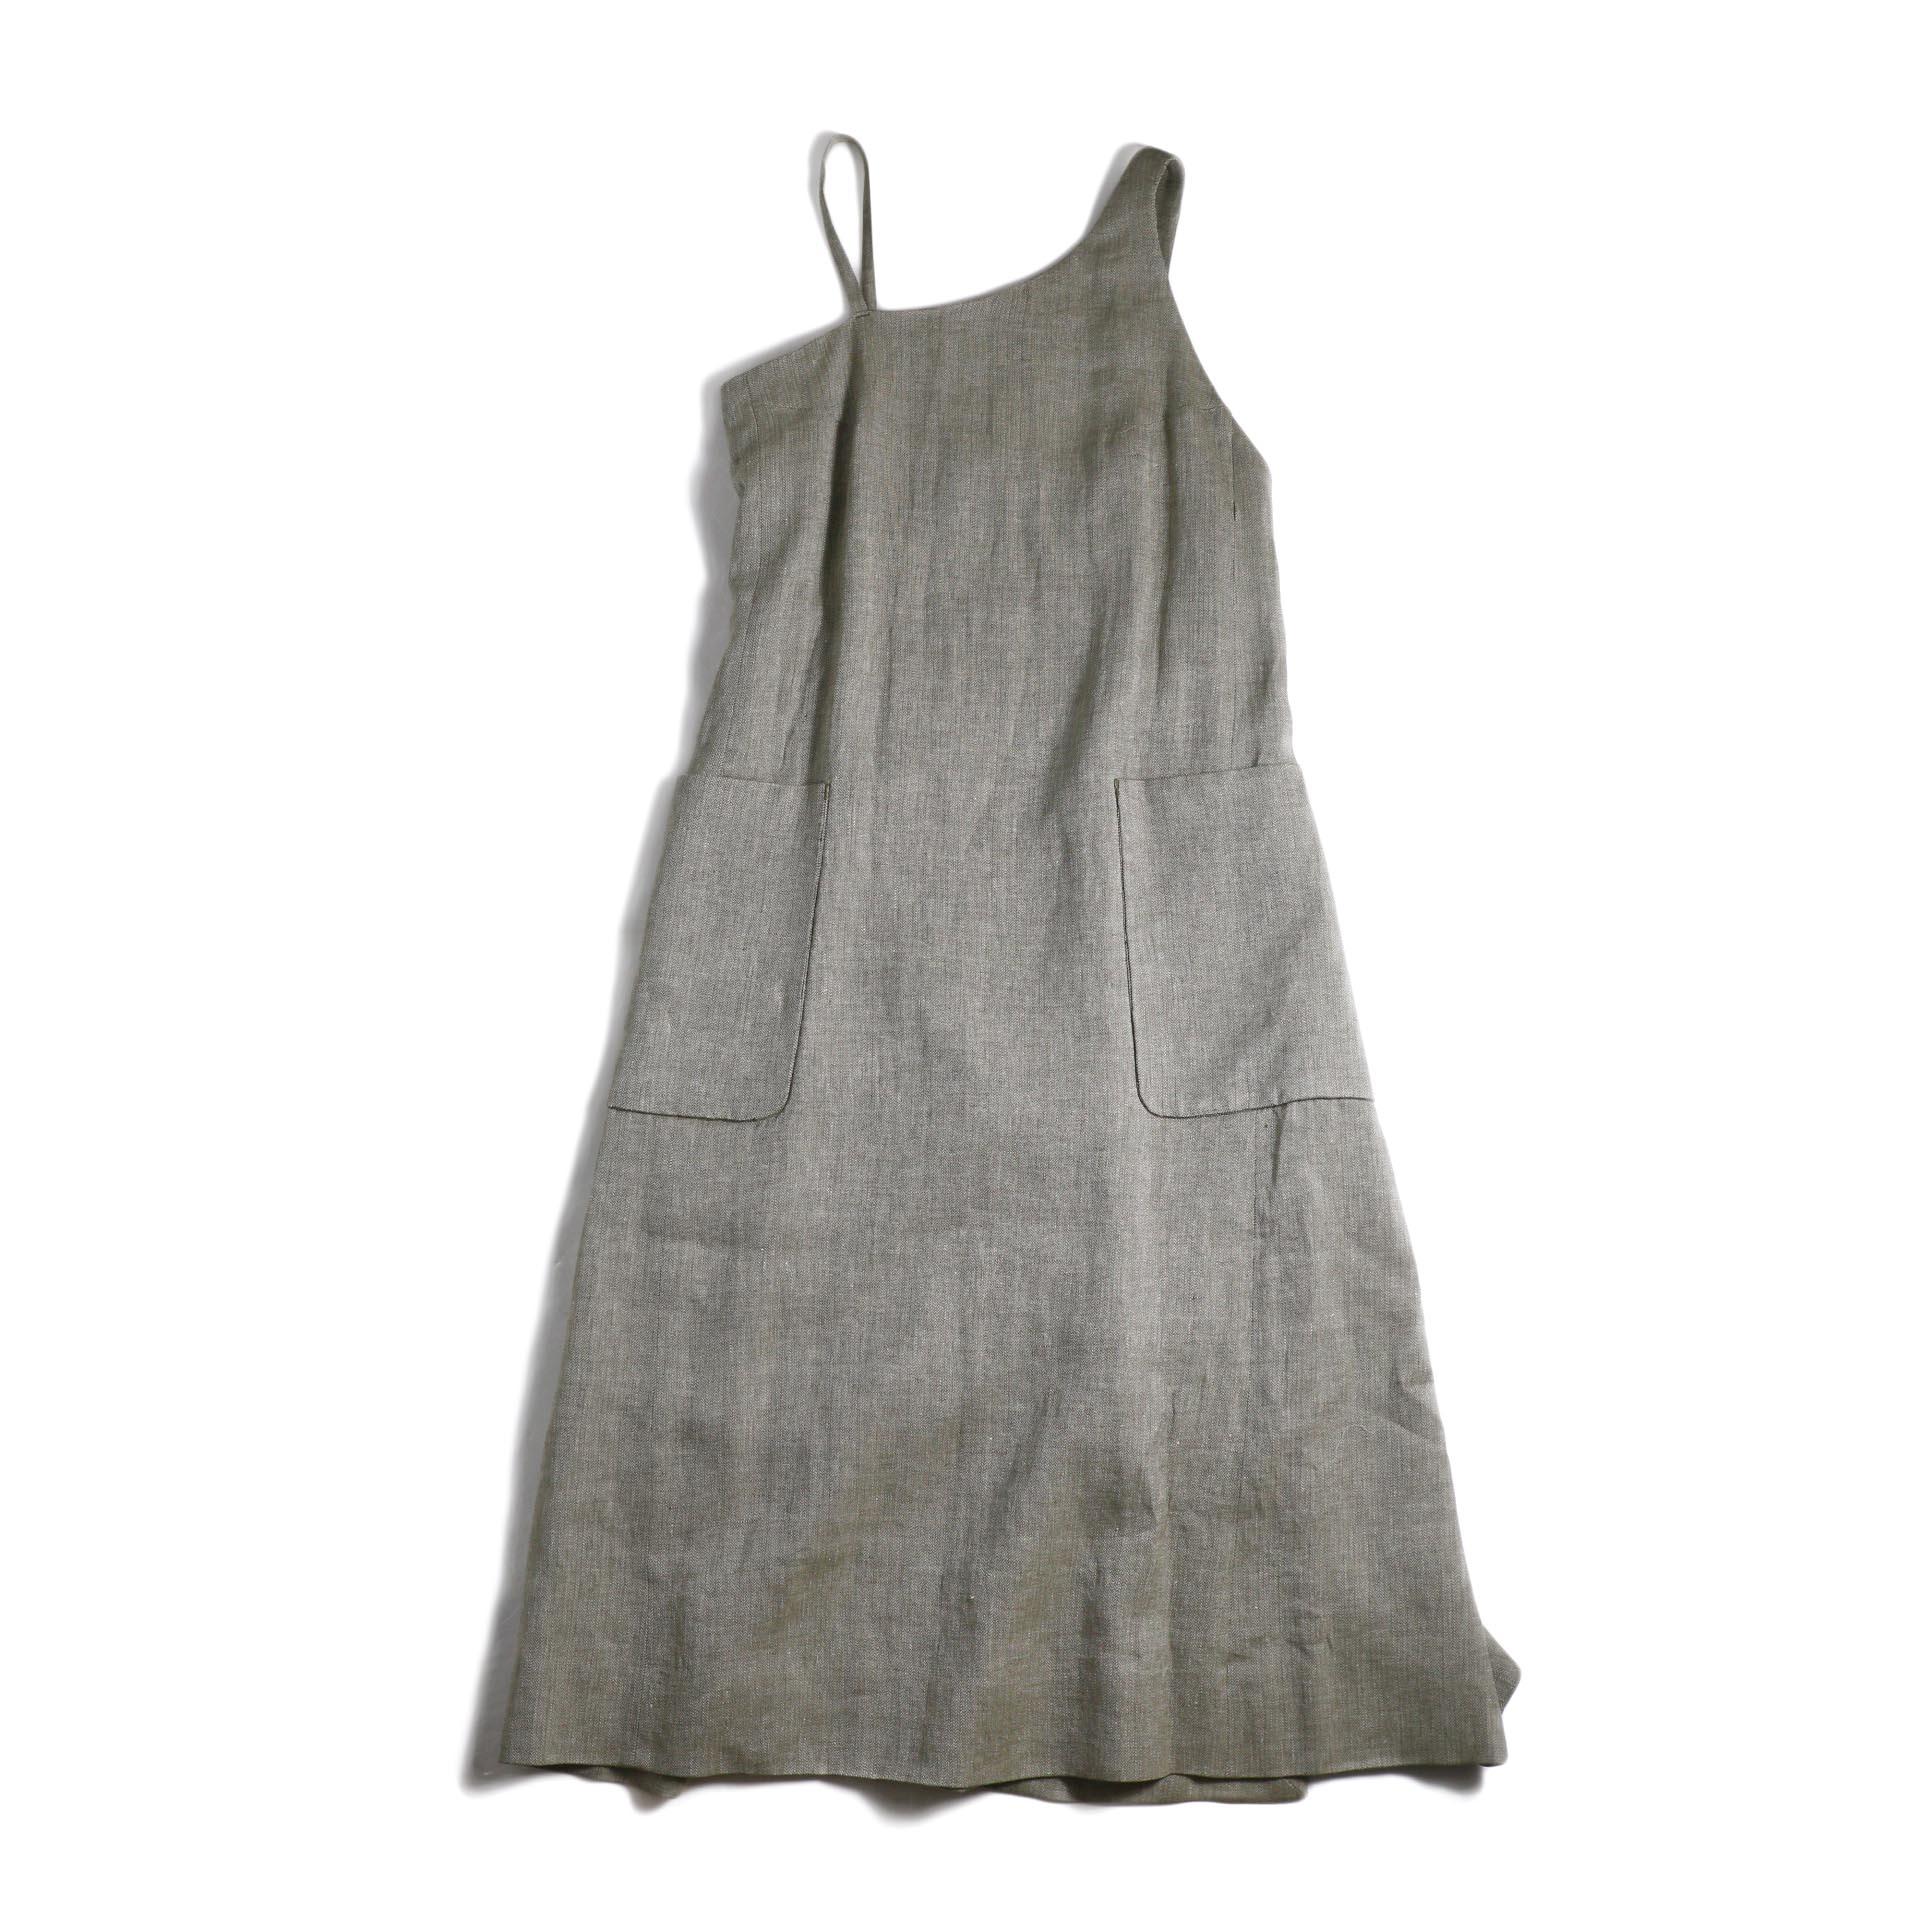 FUMIKA UCHIDA / Linen Herringbone One Shoulder Apron Dress -Olive